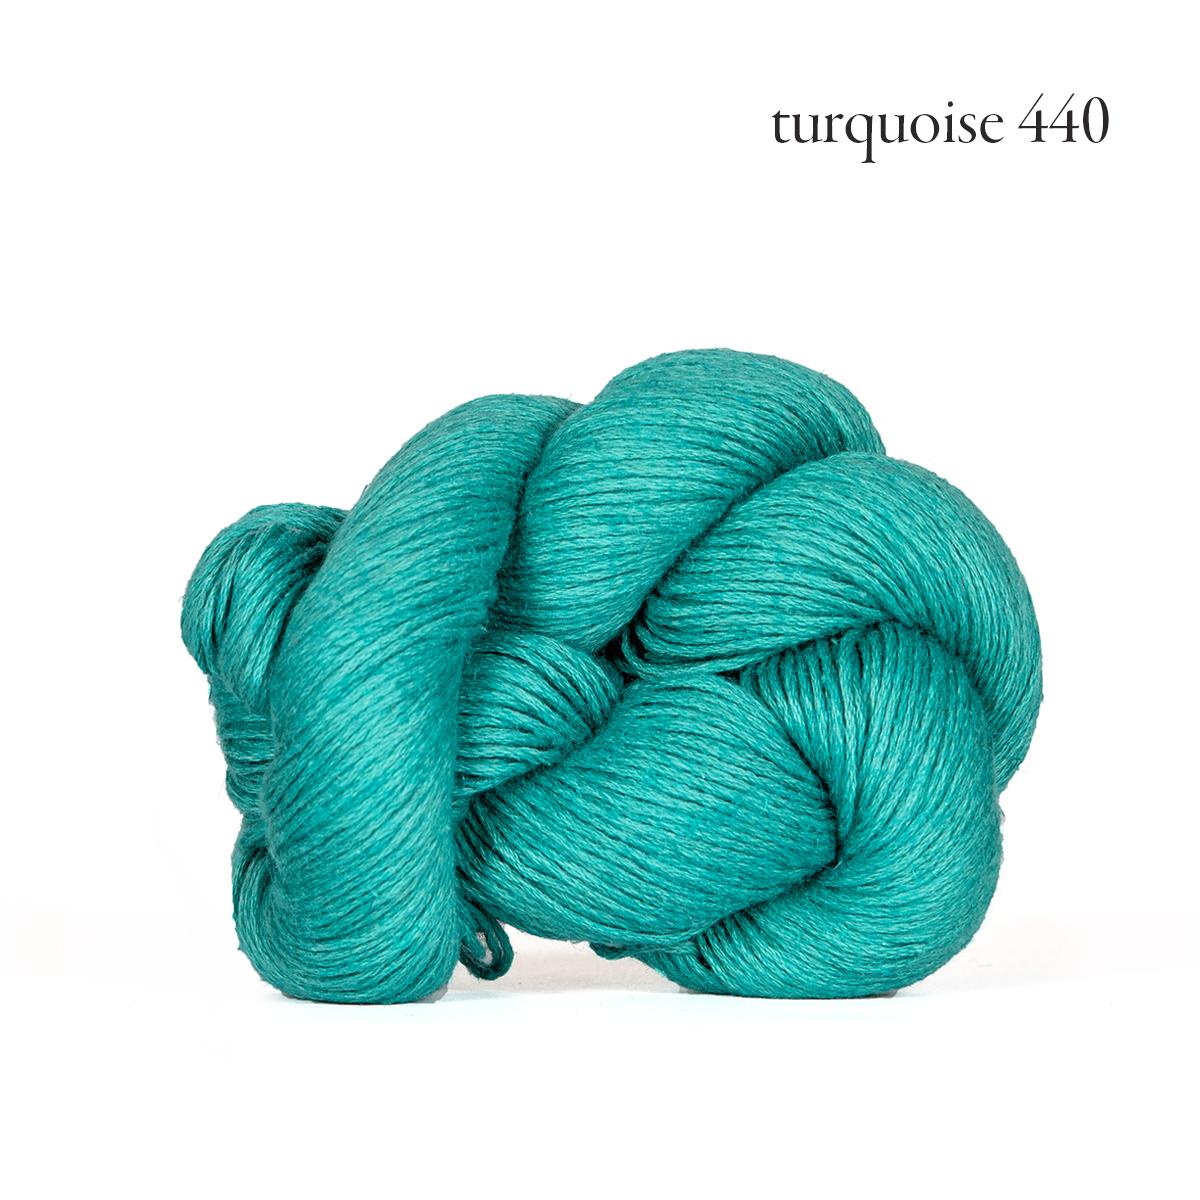 mojave turquoise 440.jpg